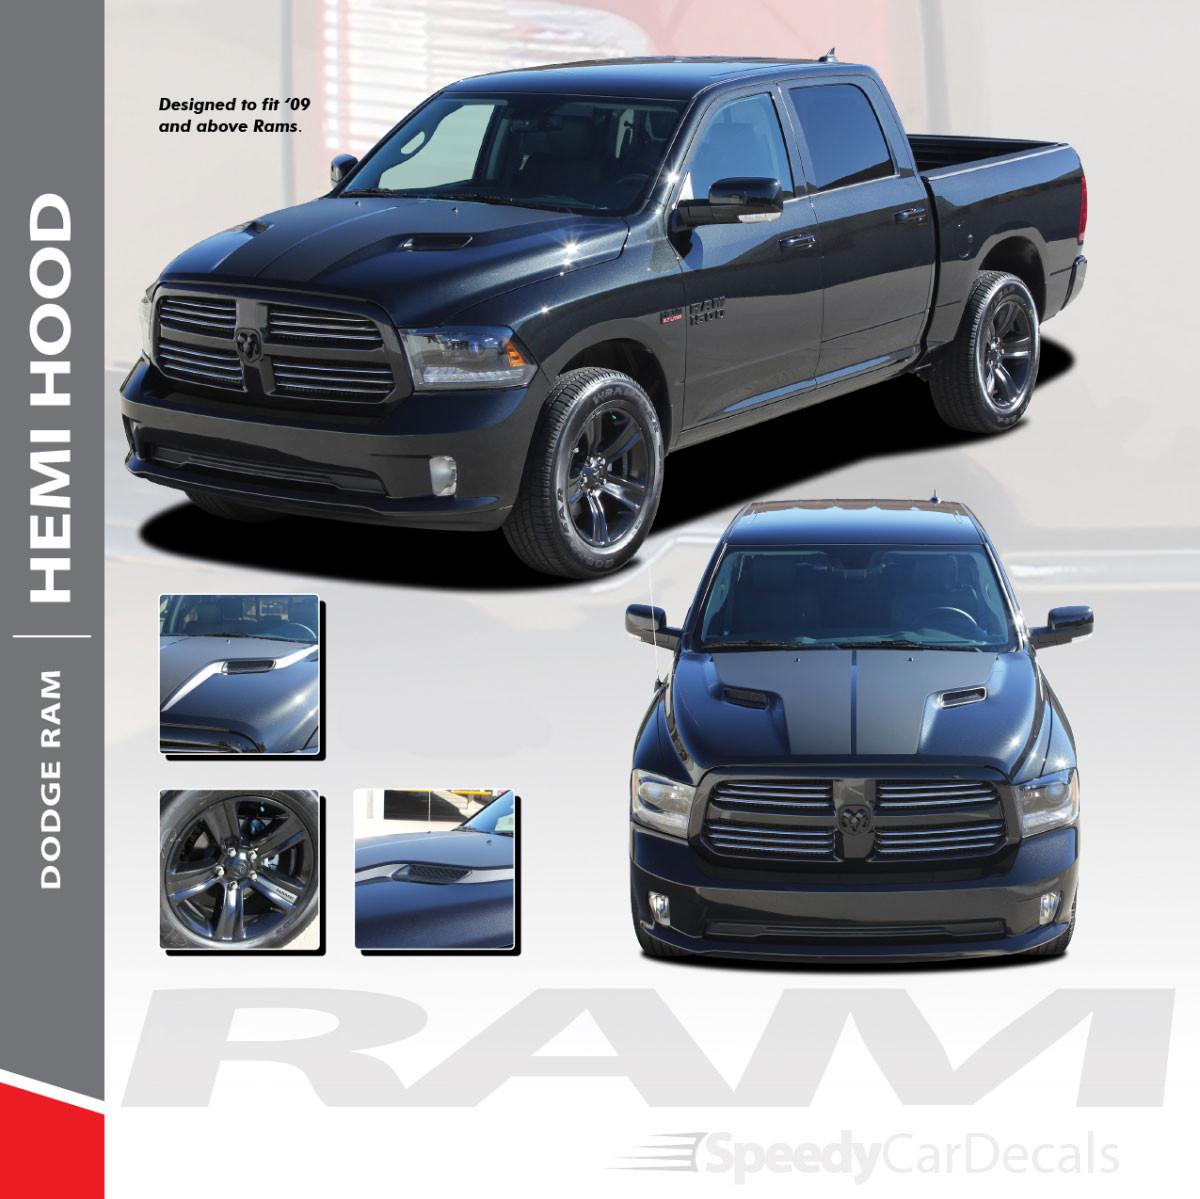 Factory Style Dodge Ram 1500 Hemi Hood Stripes 2009 2018